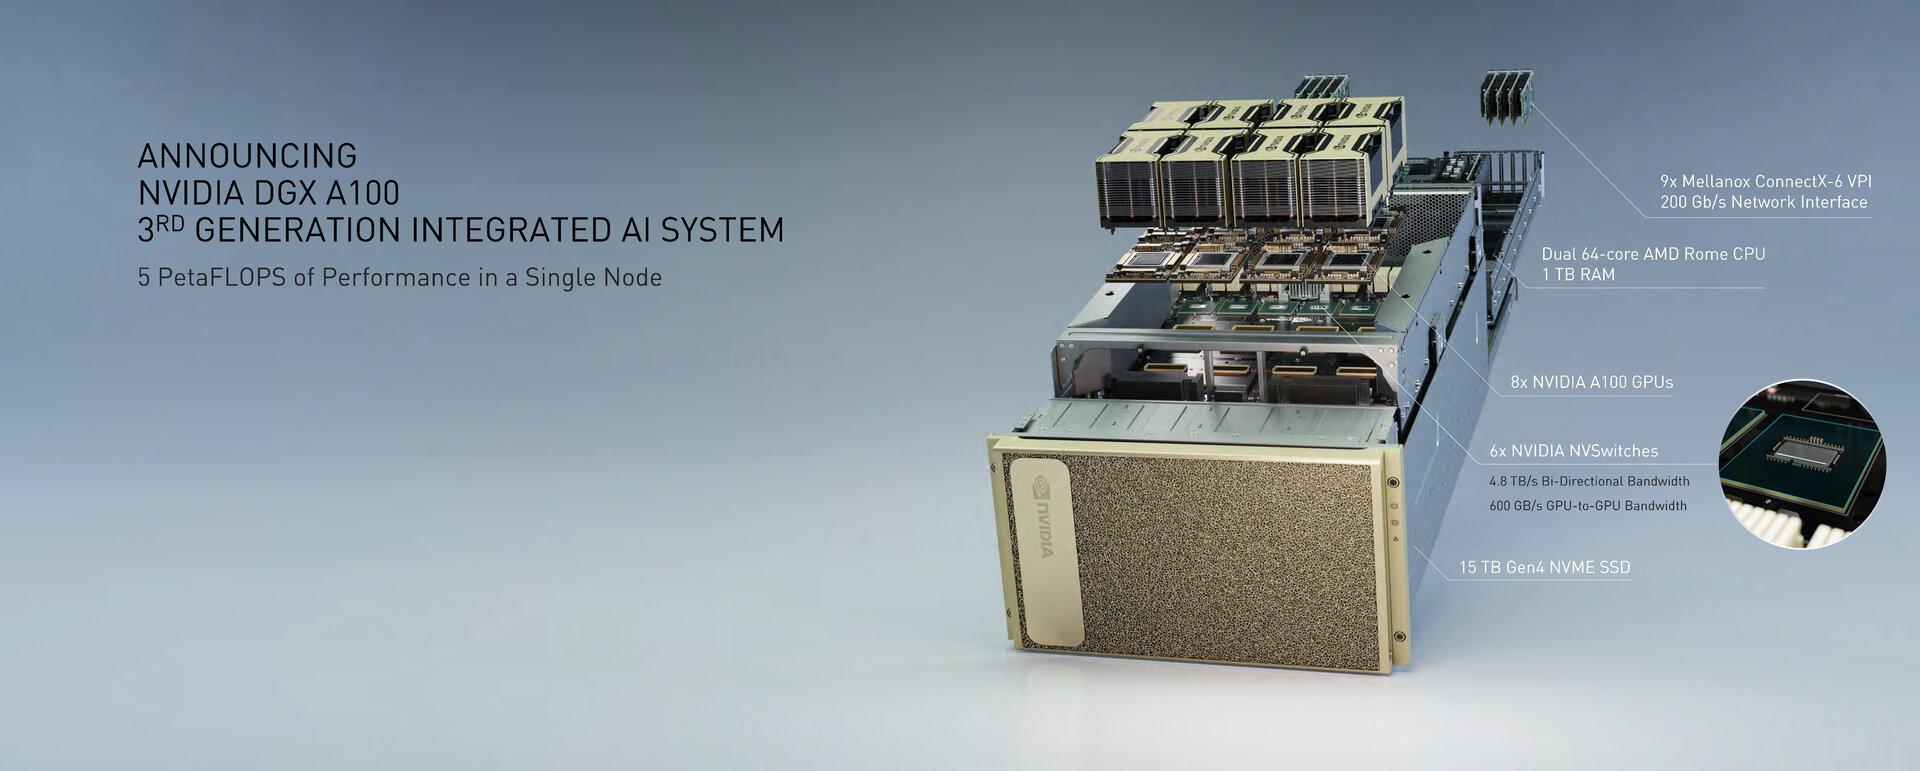 Nvidia DGX A100 als Komplettsystem mit acht SXM4-Modulen